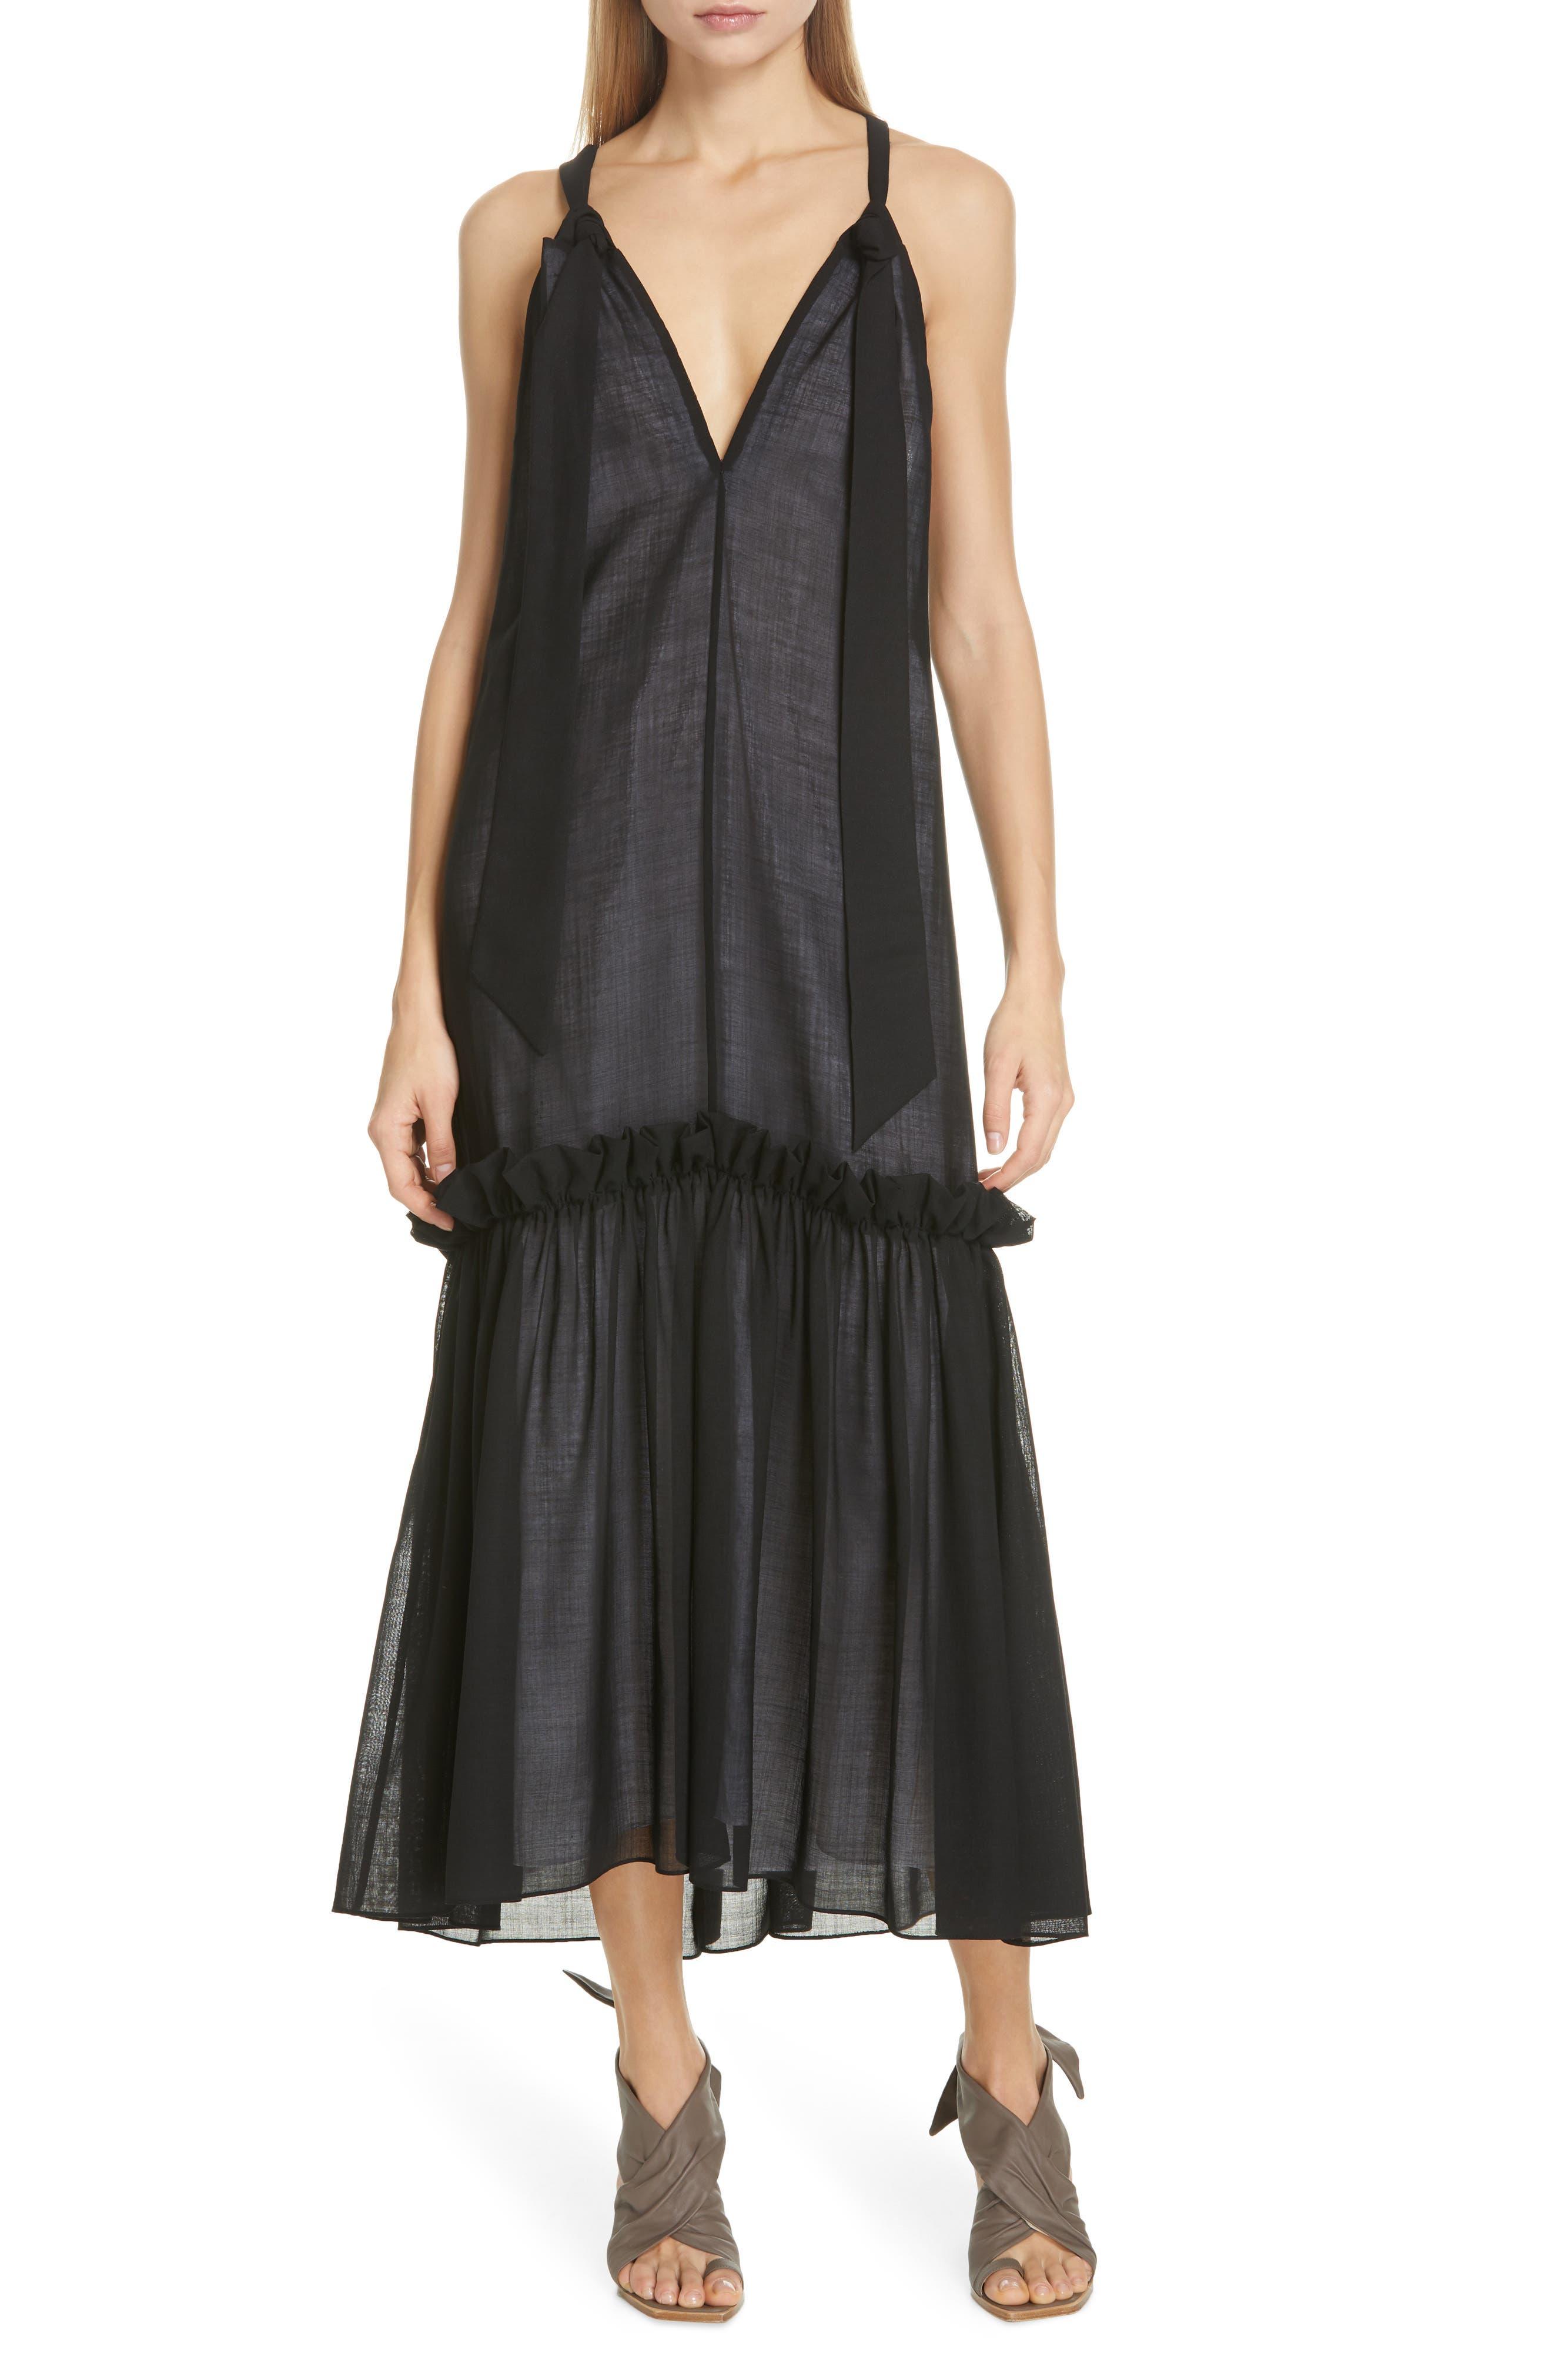 Tibi Reversible Tie Neck Dress, Black